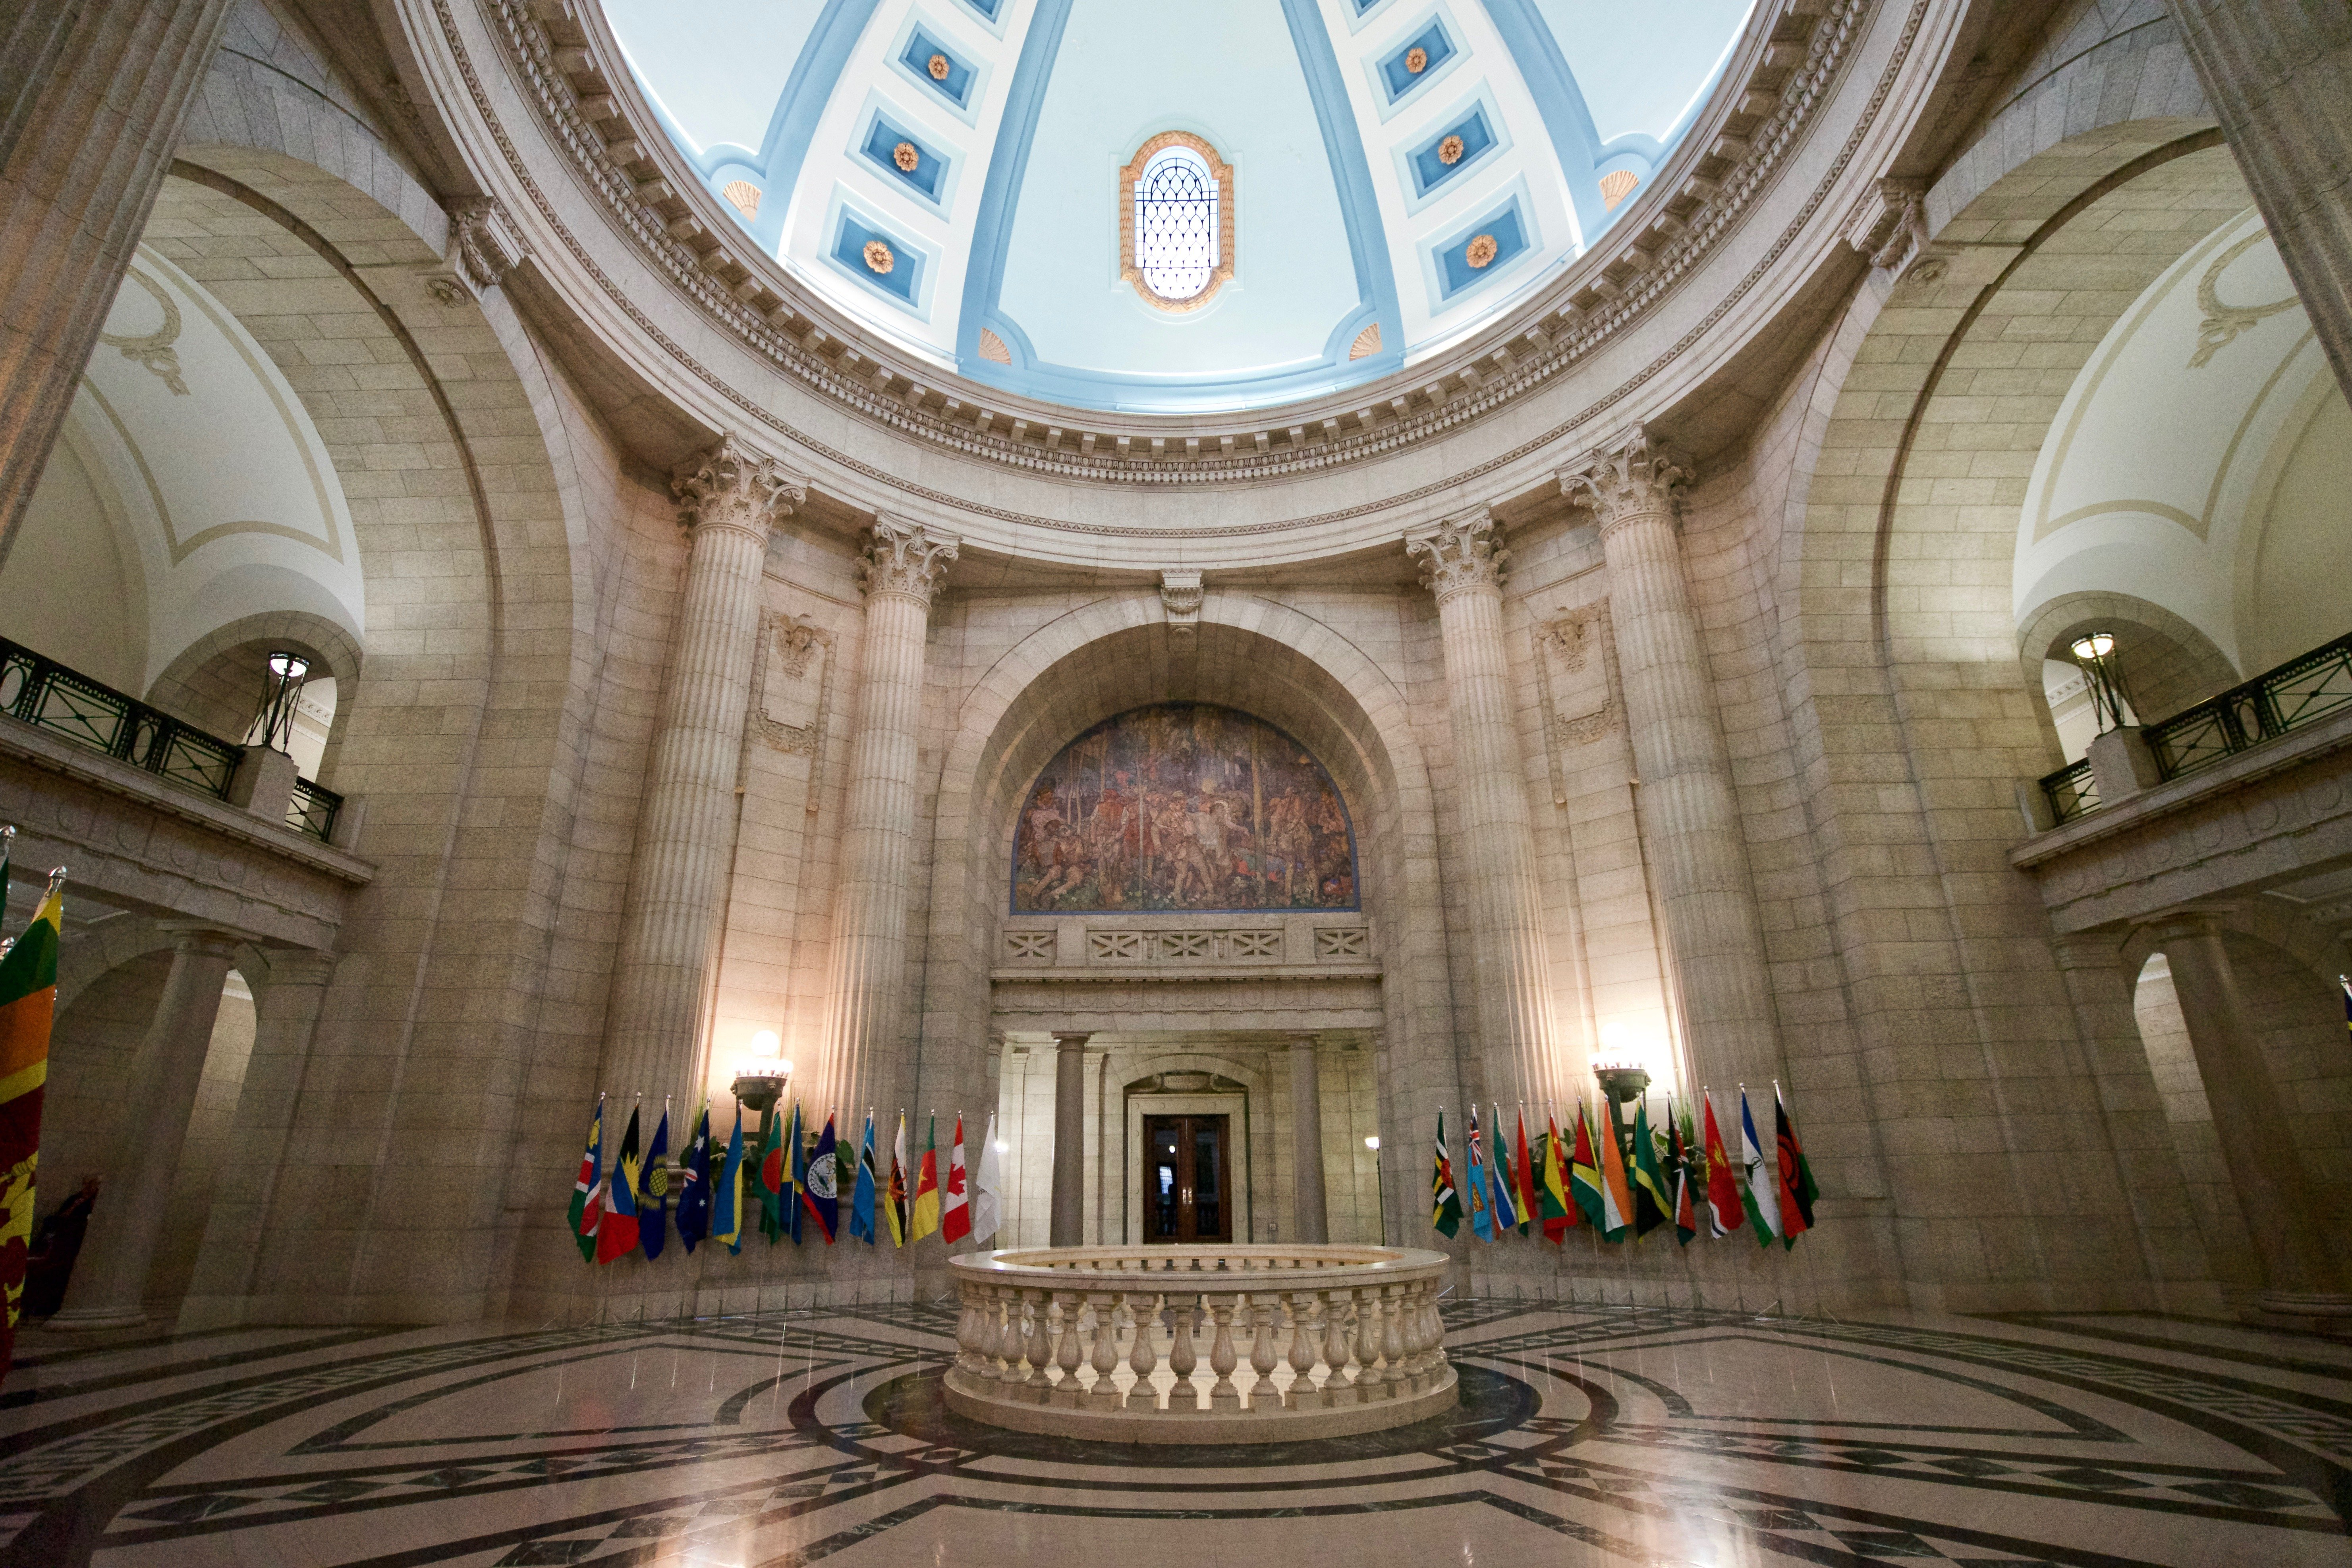 The majestic domed lobby of the Manitoba Legislative Building in Winnipeg.